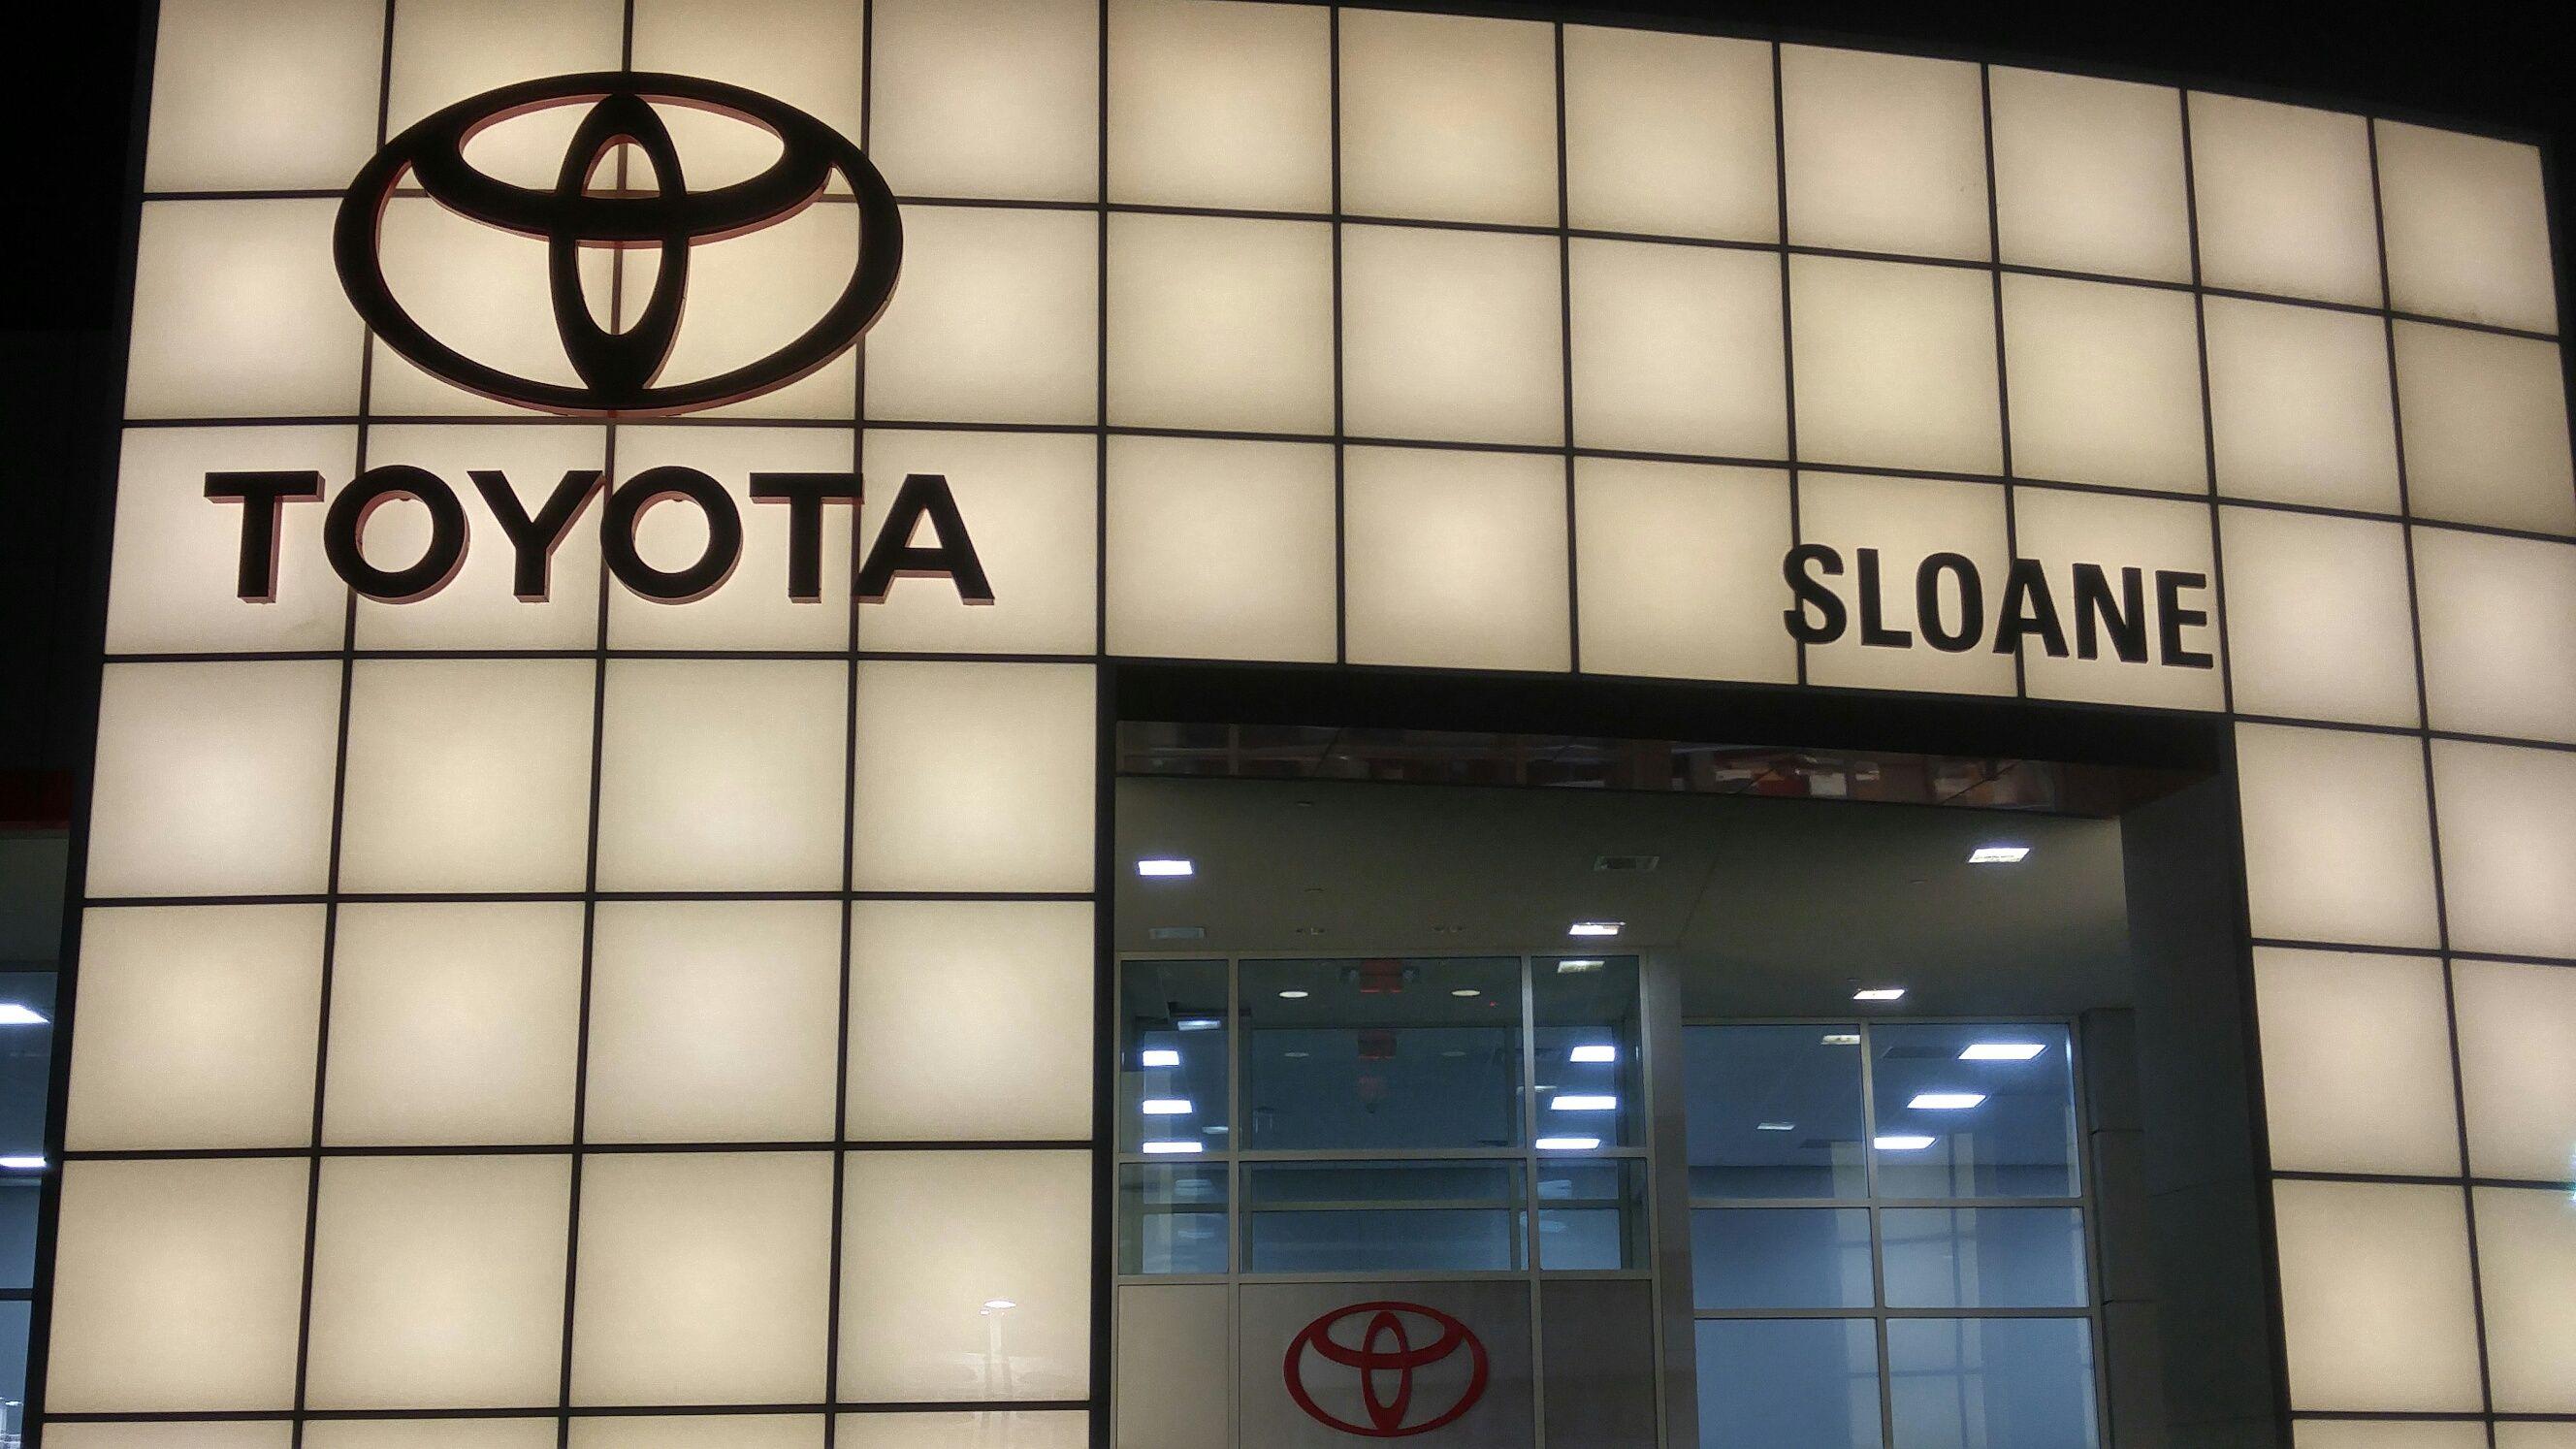 Sloane Toyota Of Philadelphia >> Sloane Toyota Of Philadelphia Formally Champion Toyota Located On